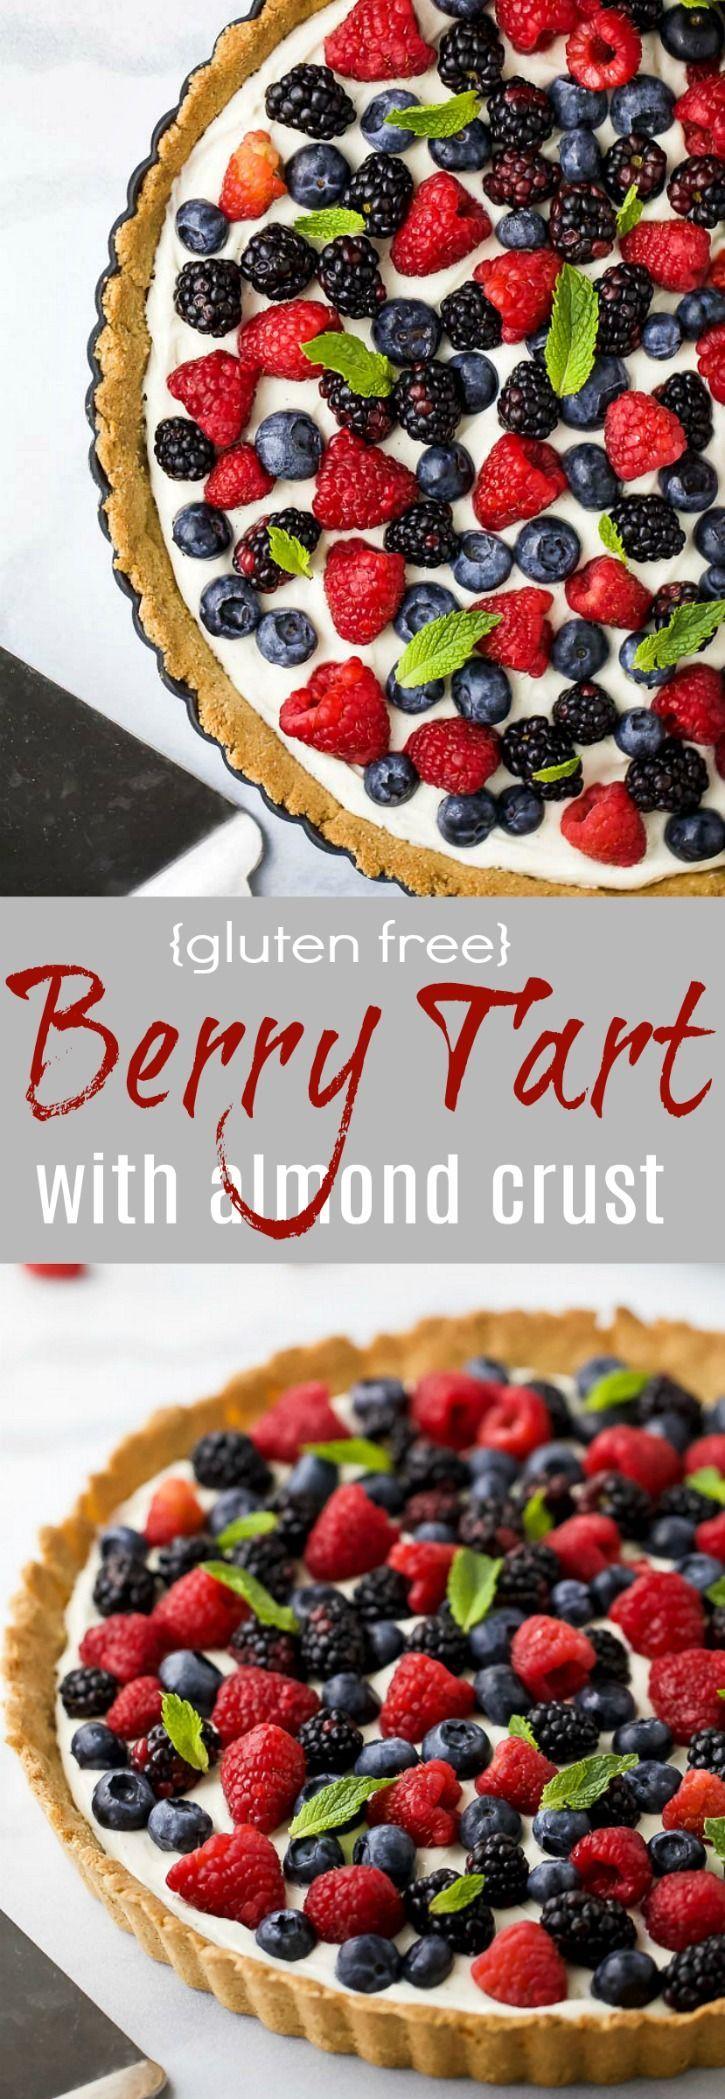 Gluten Free Berry Tart with Almond Crust